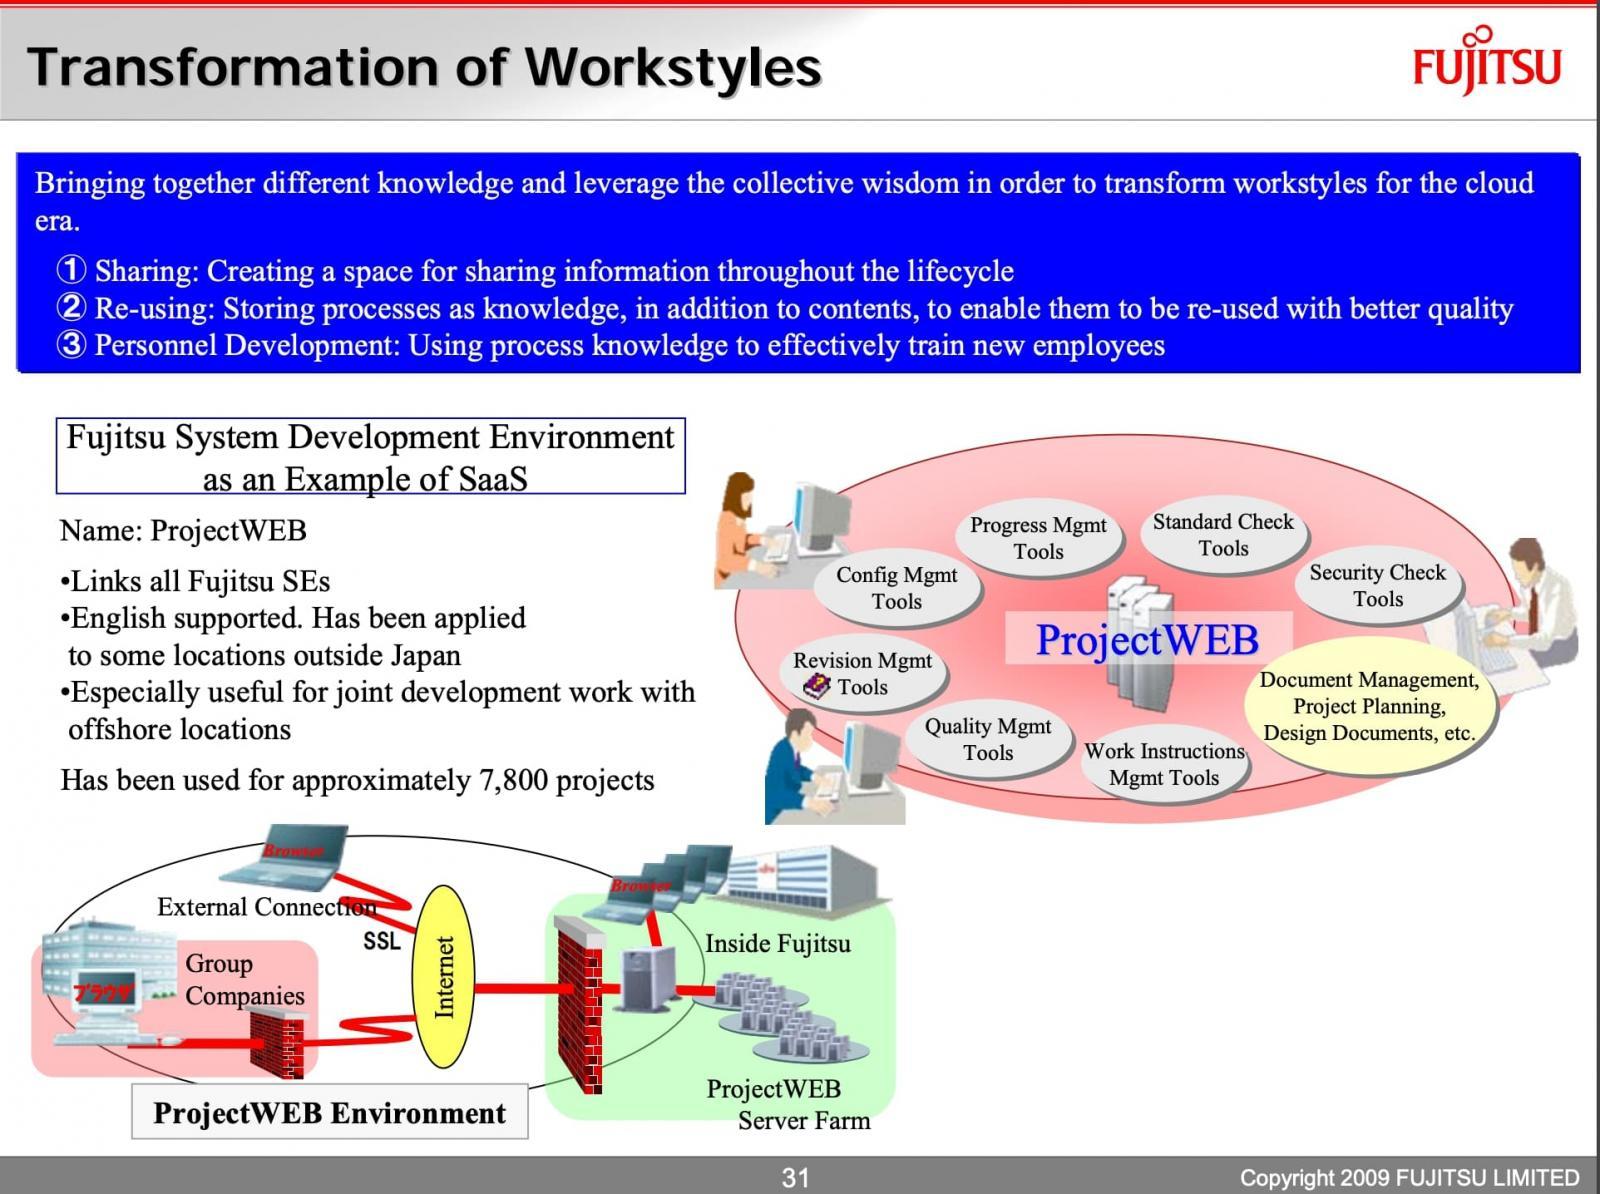 Japanese tech giant Fujitsu shut down its ProjectWEB platform due to cyberattack